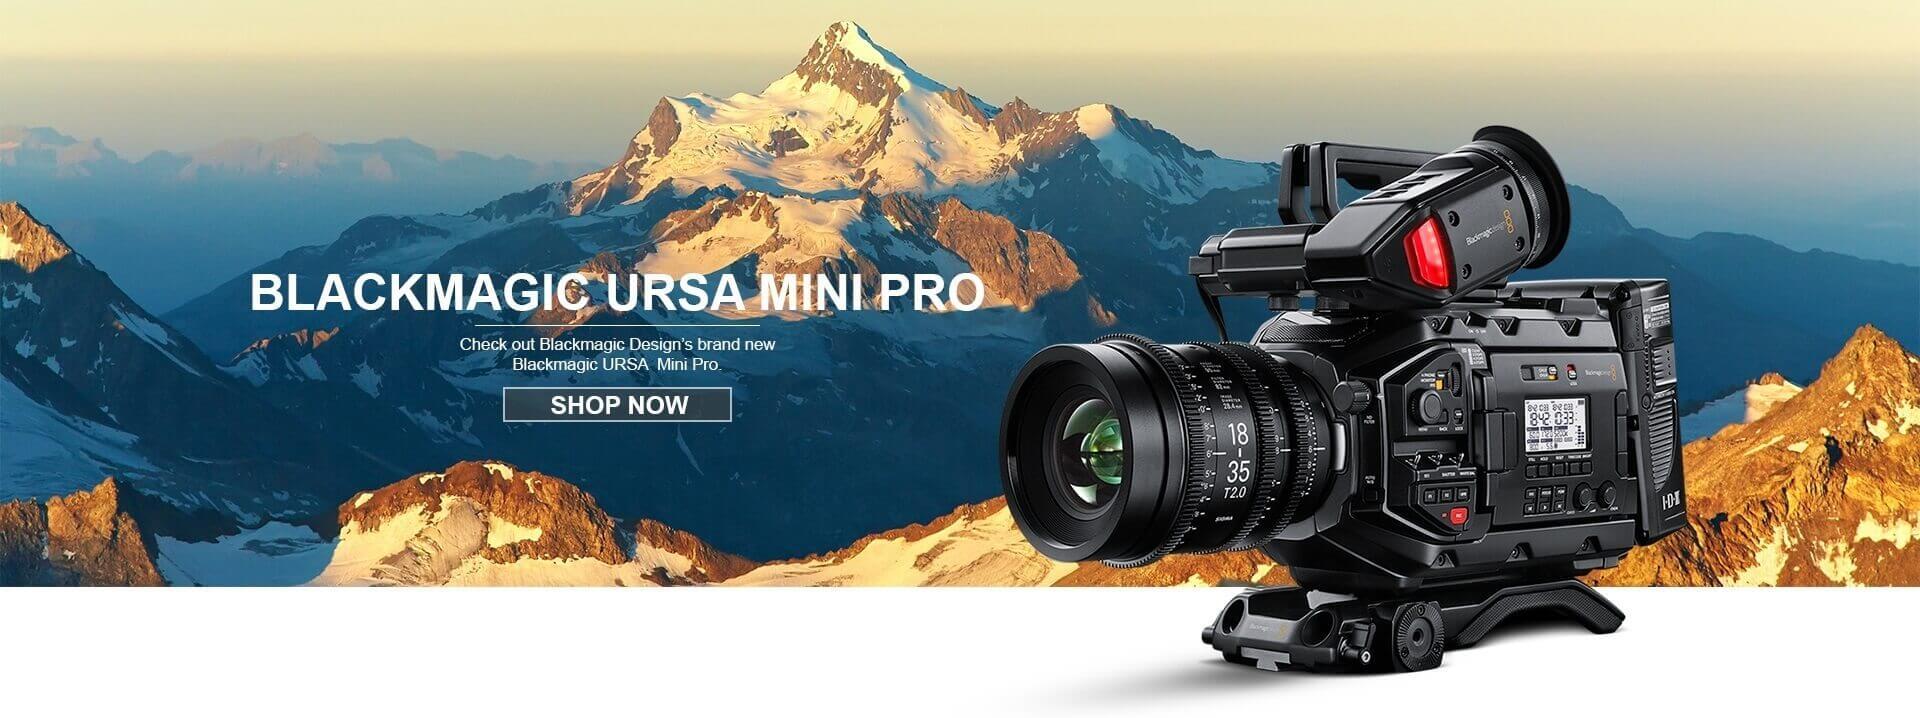 Blackmagic Design URSA Mini Pro